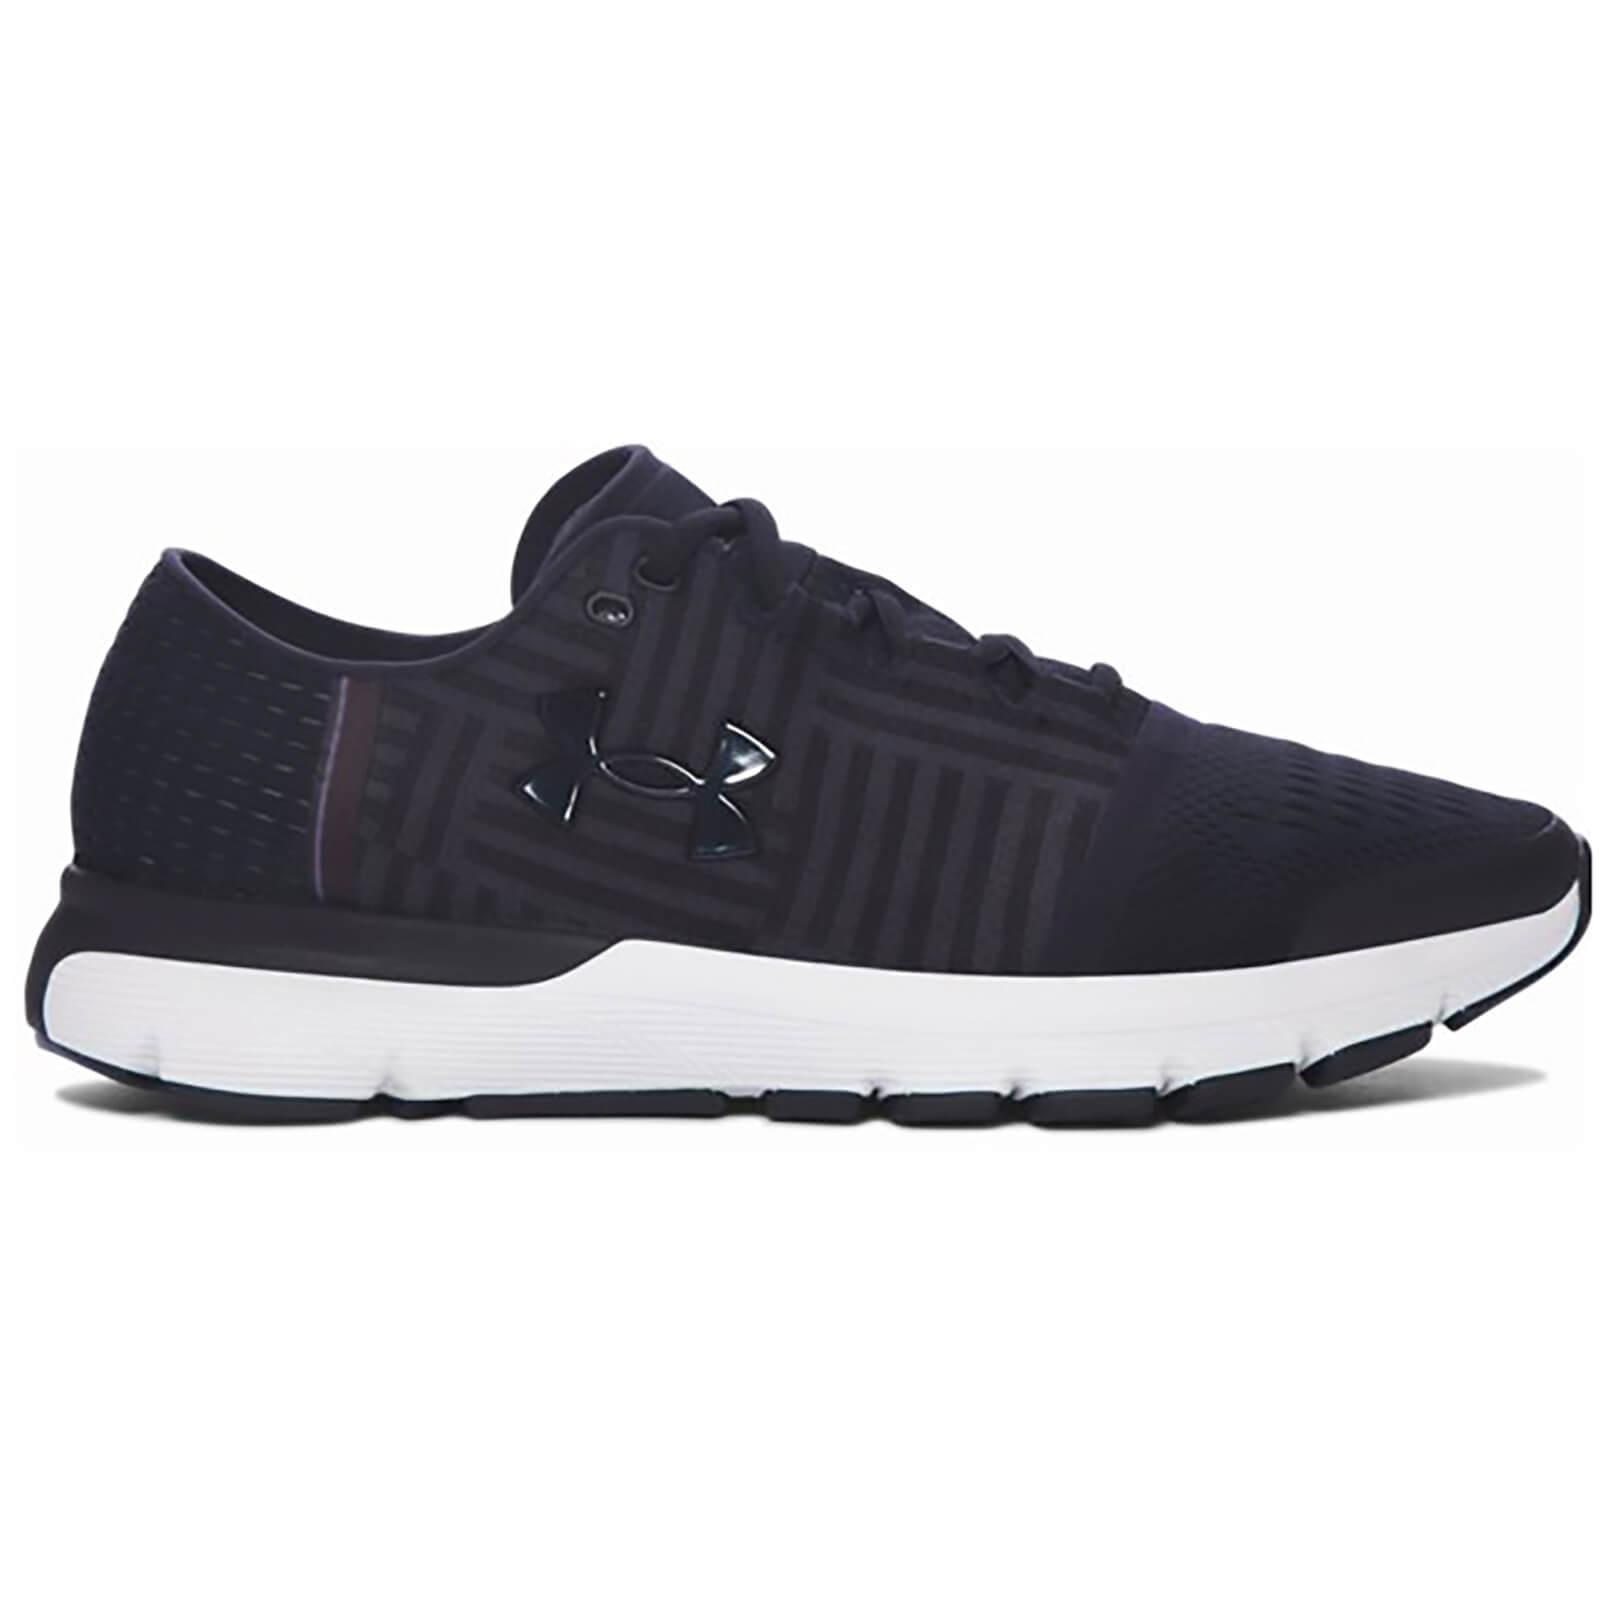 Lifetime Warranty Mens Shoes Athletic